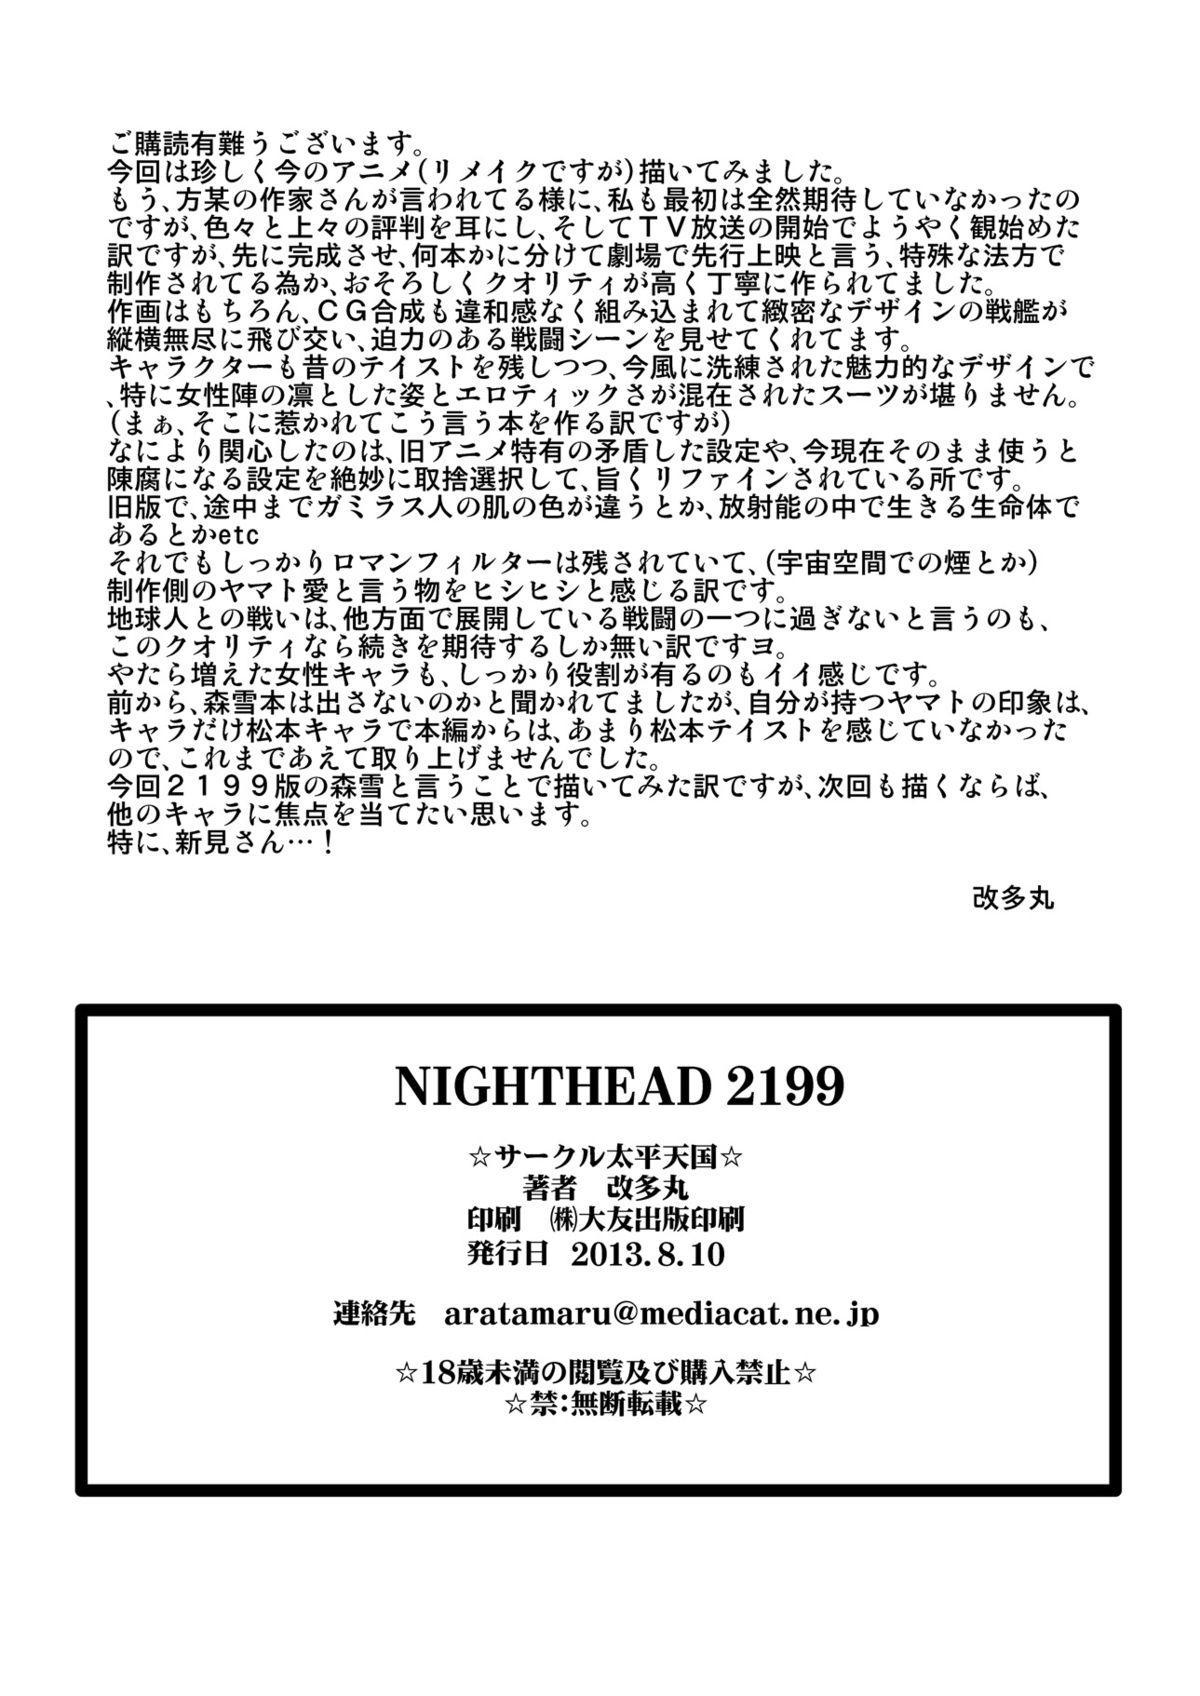 Nighthead 2199 22